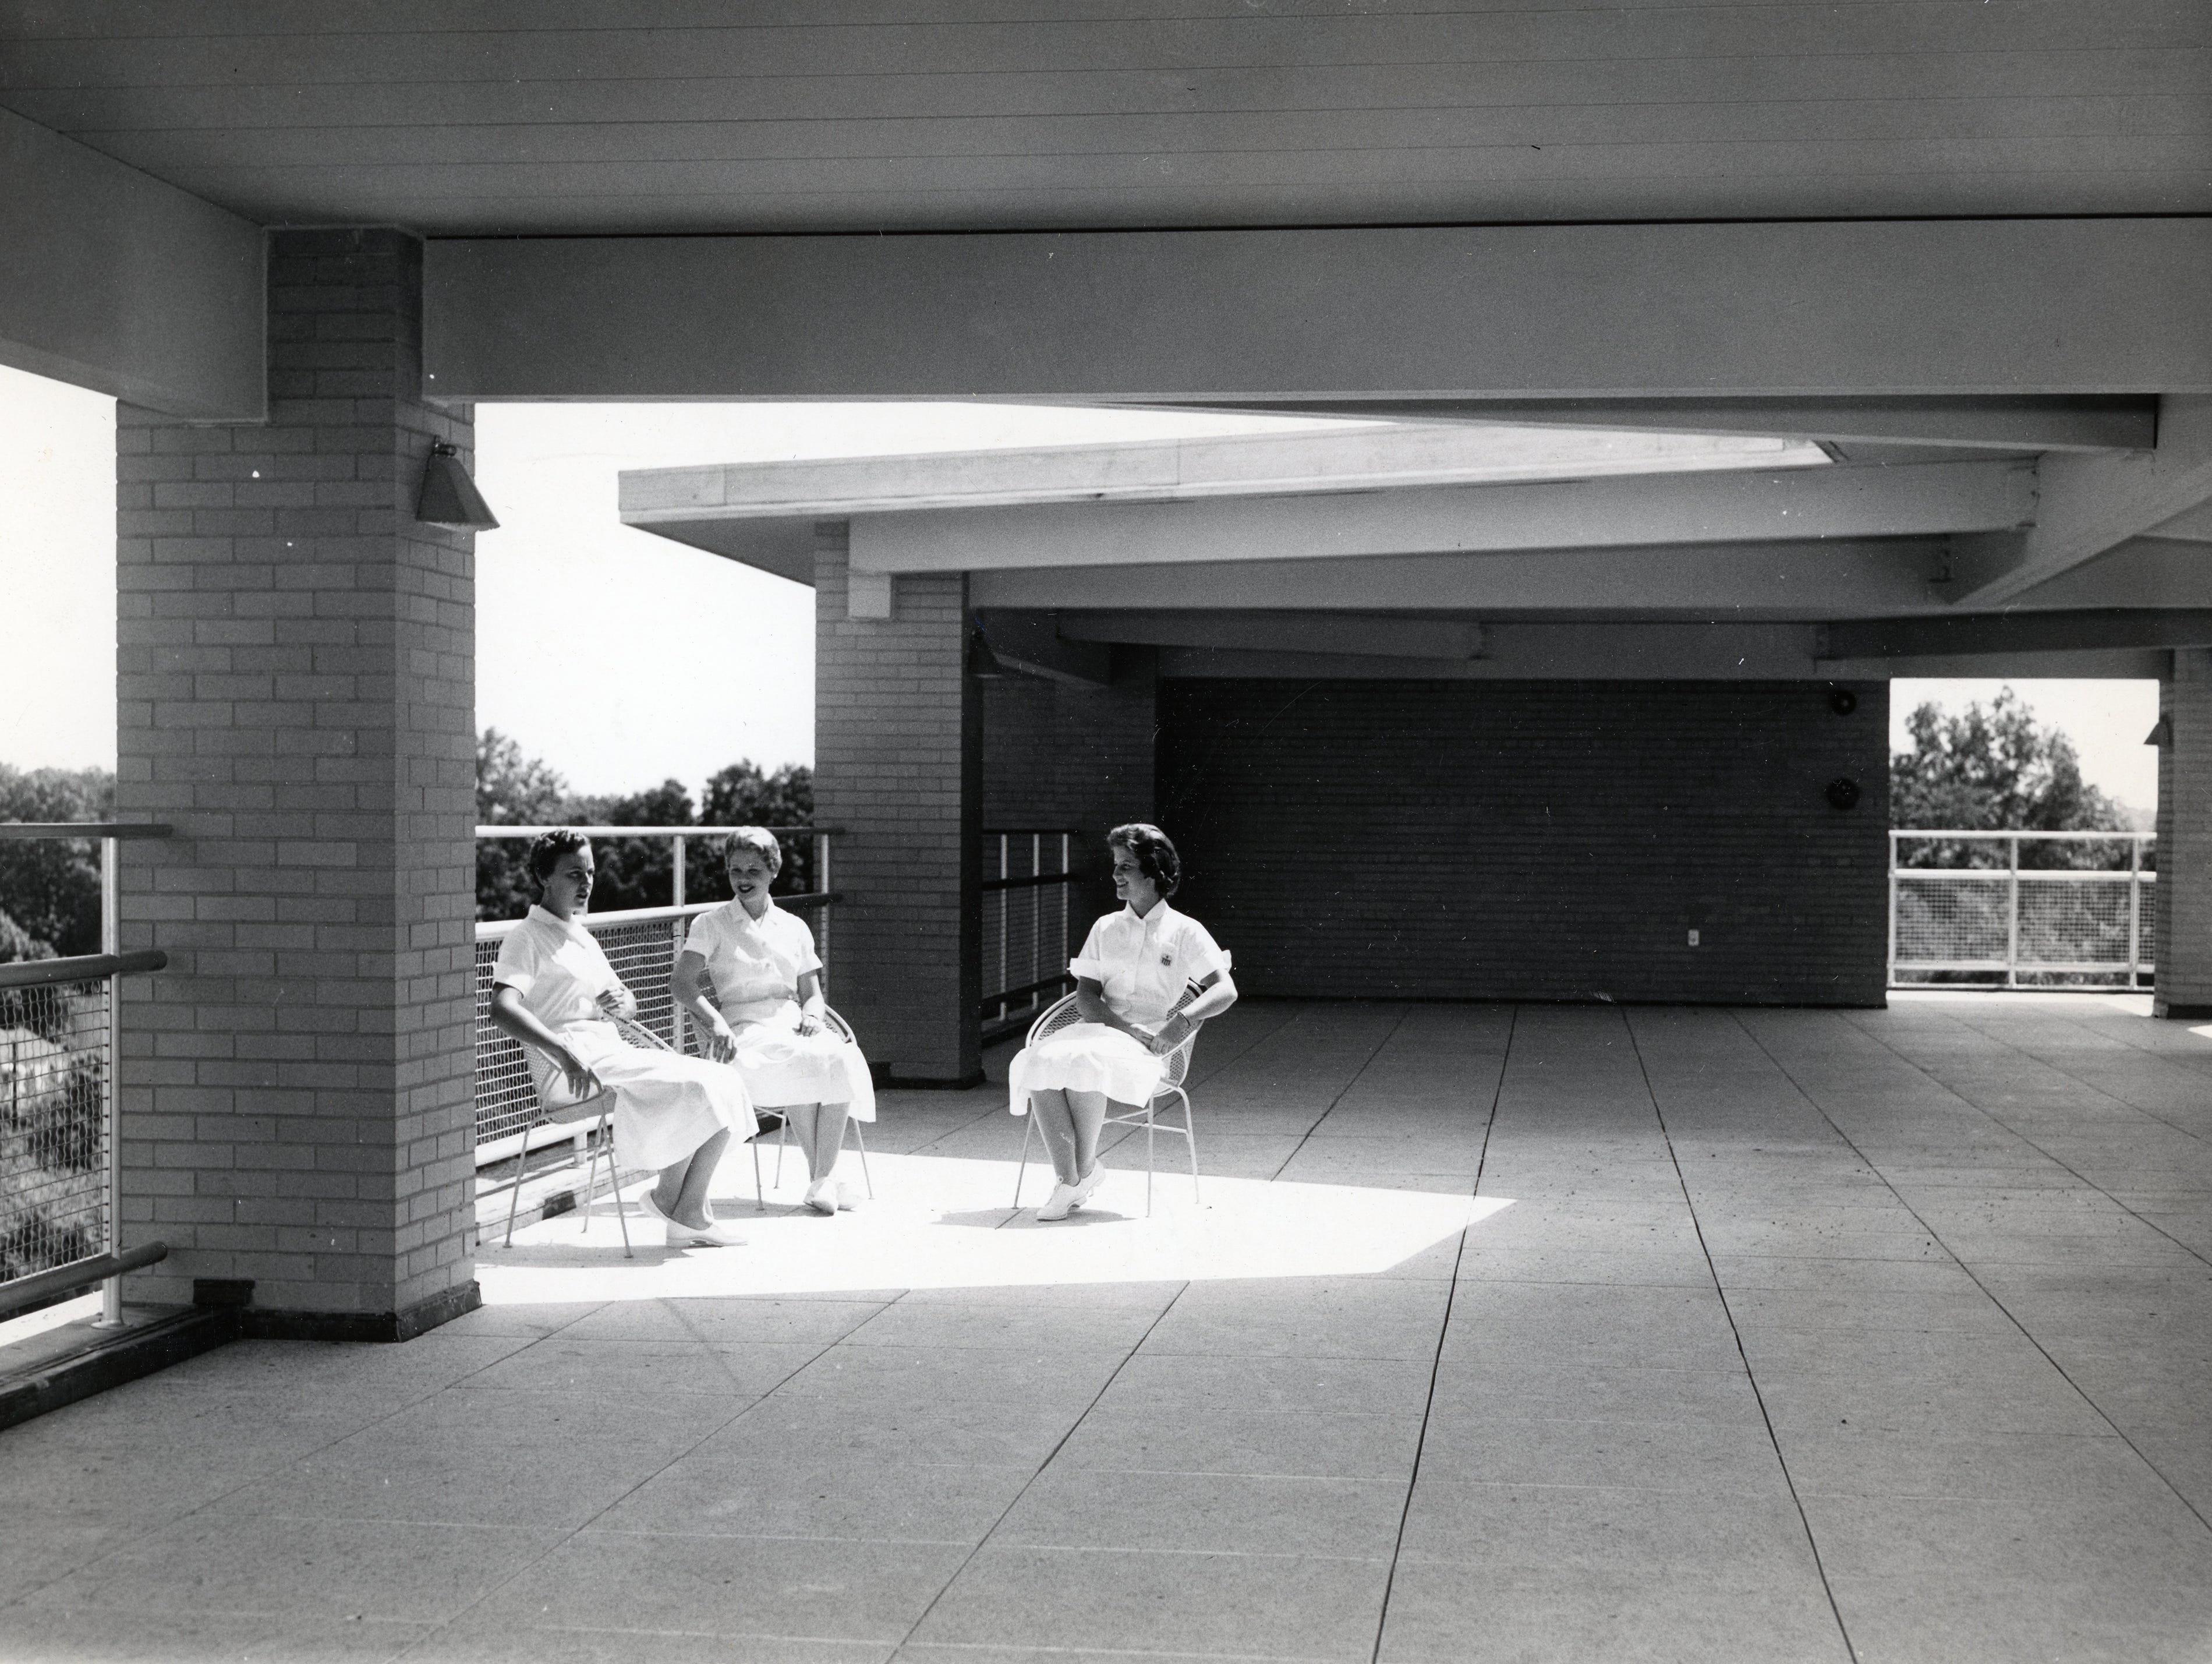 St. Mary's Hospital's new nurses' home in June 1957.